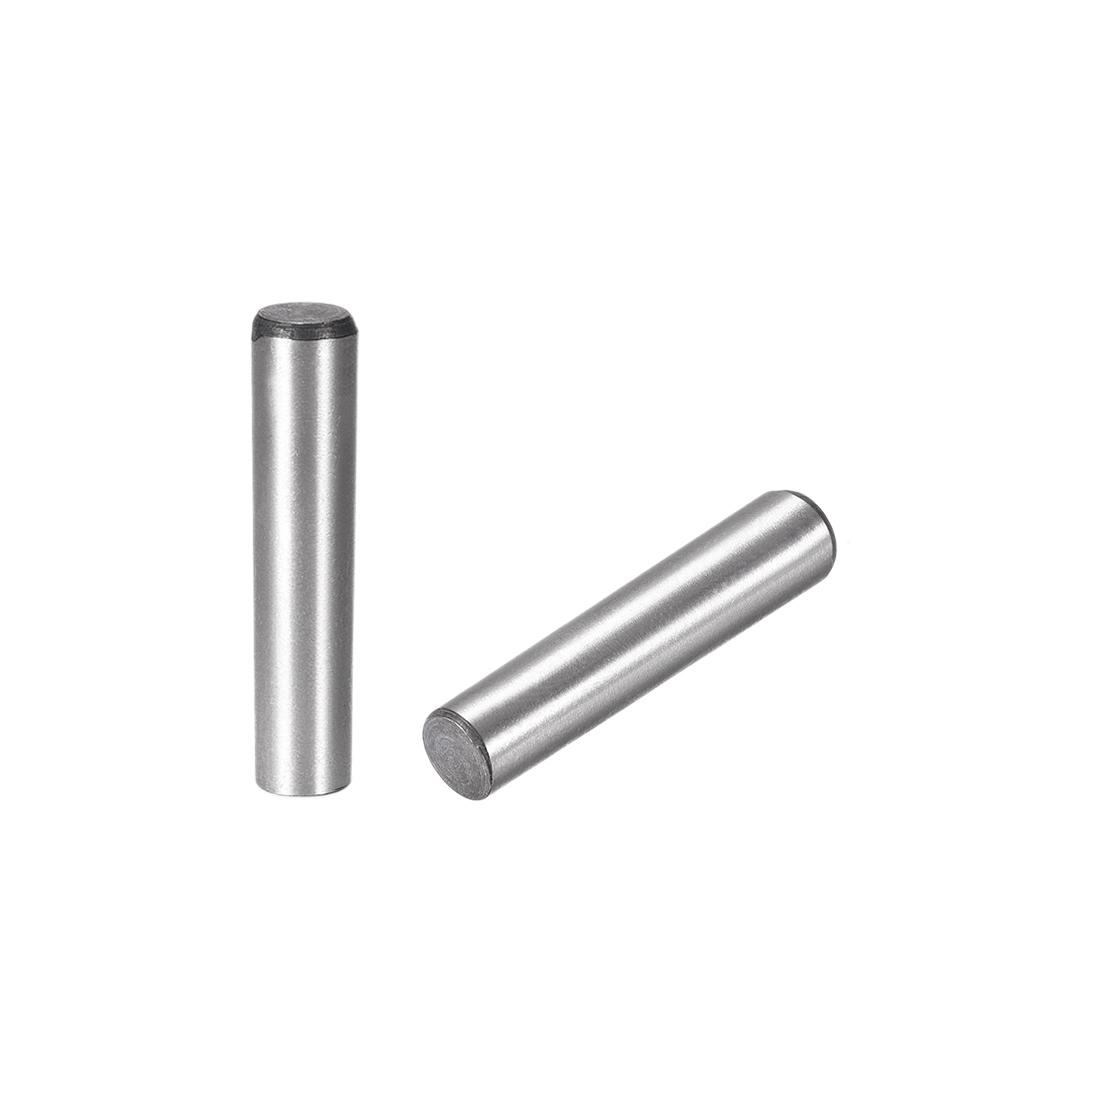 Carbon Steel GB117 45mm Length 10mmx11mm Small End Diameter 1:50 Taper Pin 5Pcs